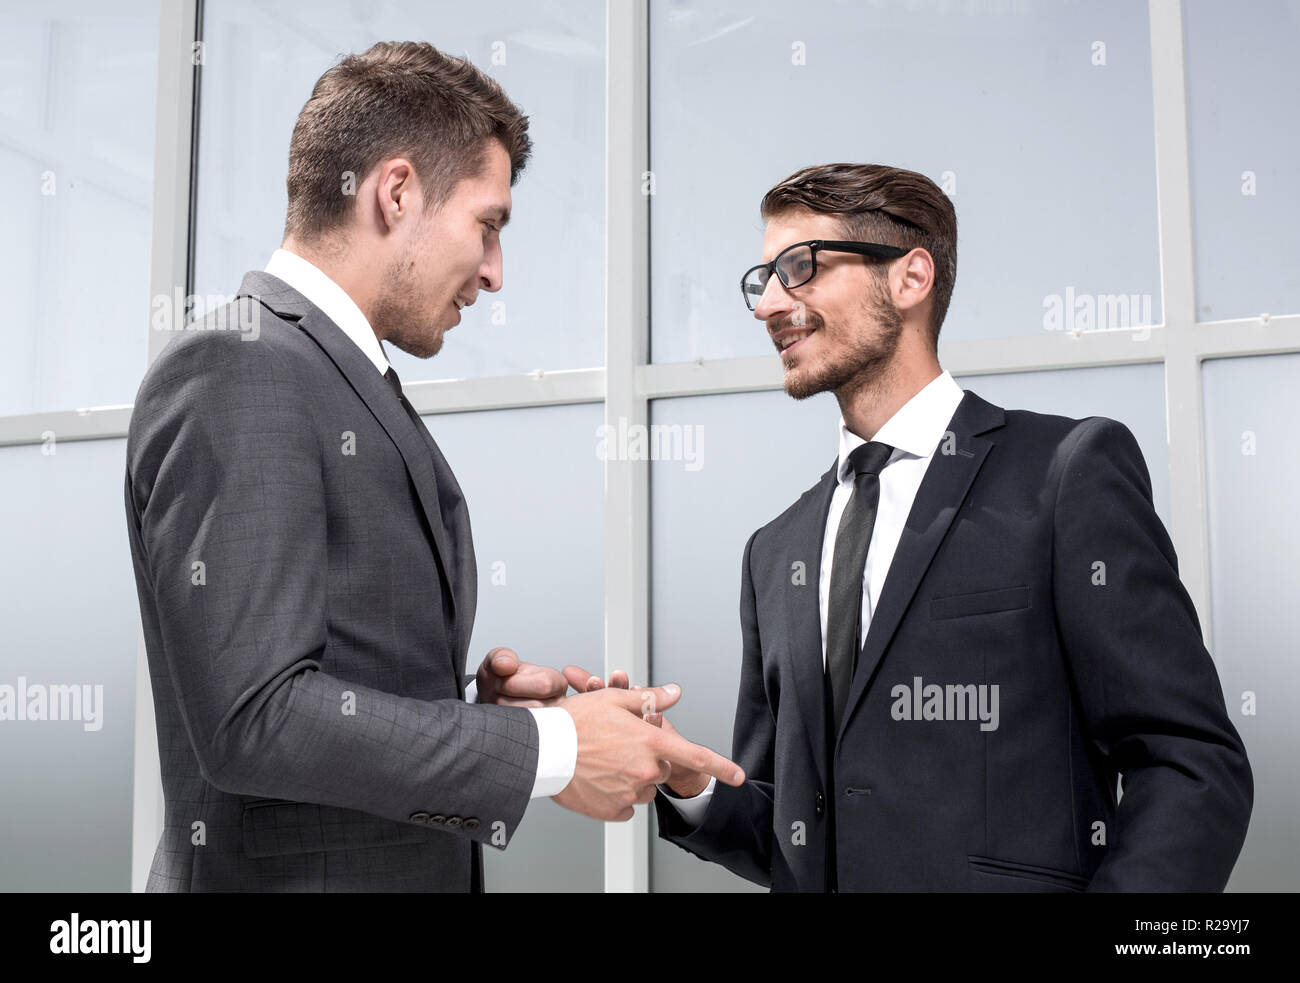 two businessmen posing - Stock Image